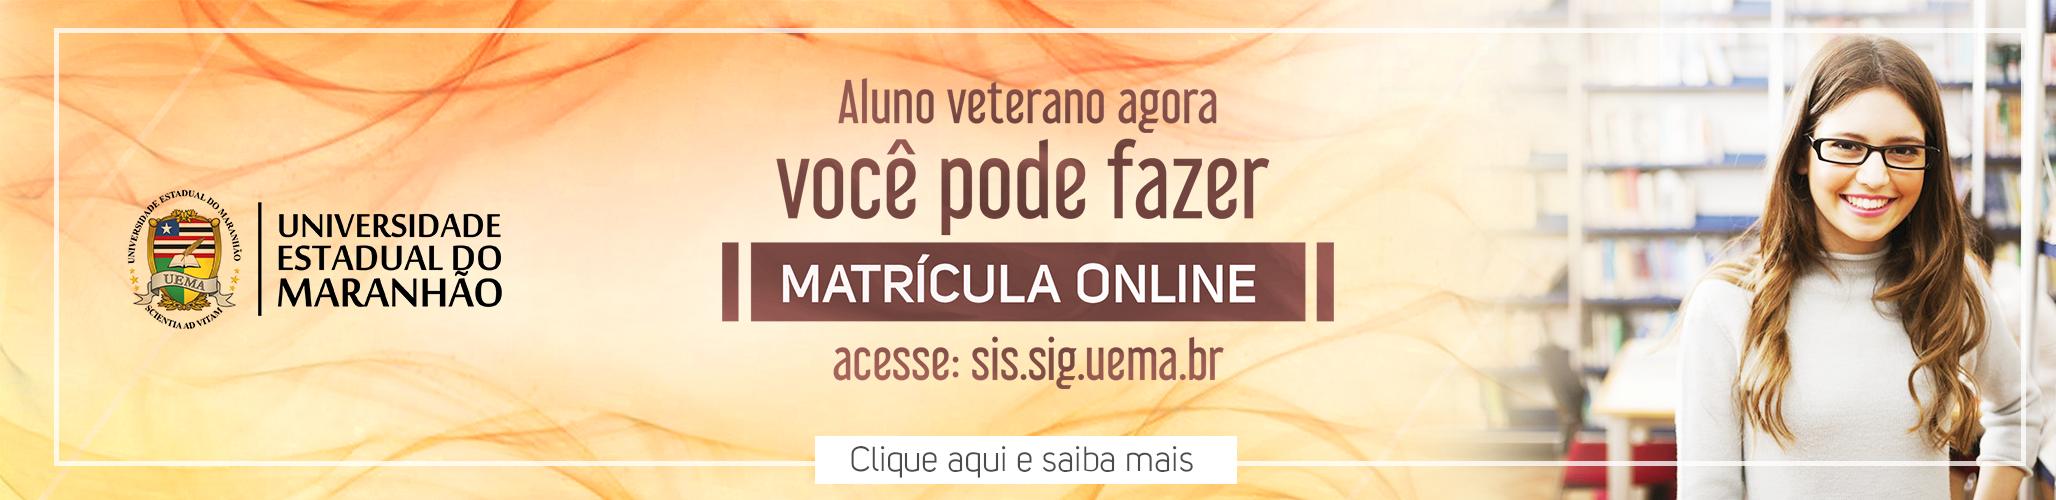 banner-Matricula-veterano